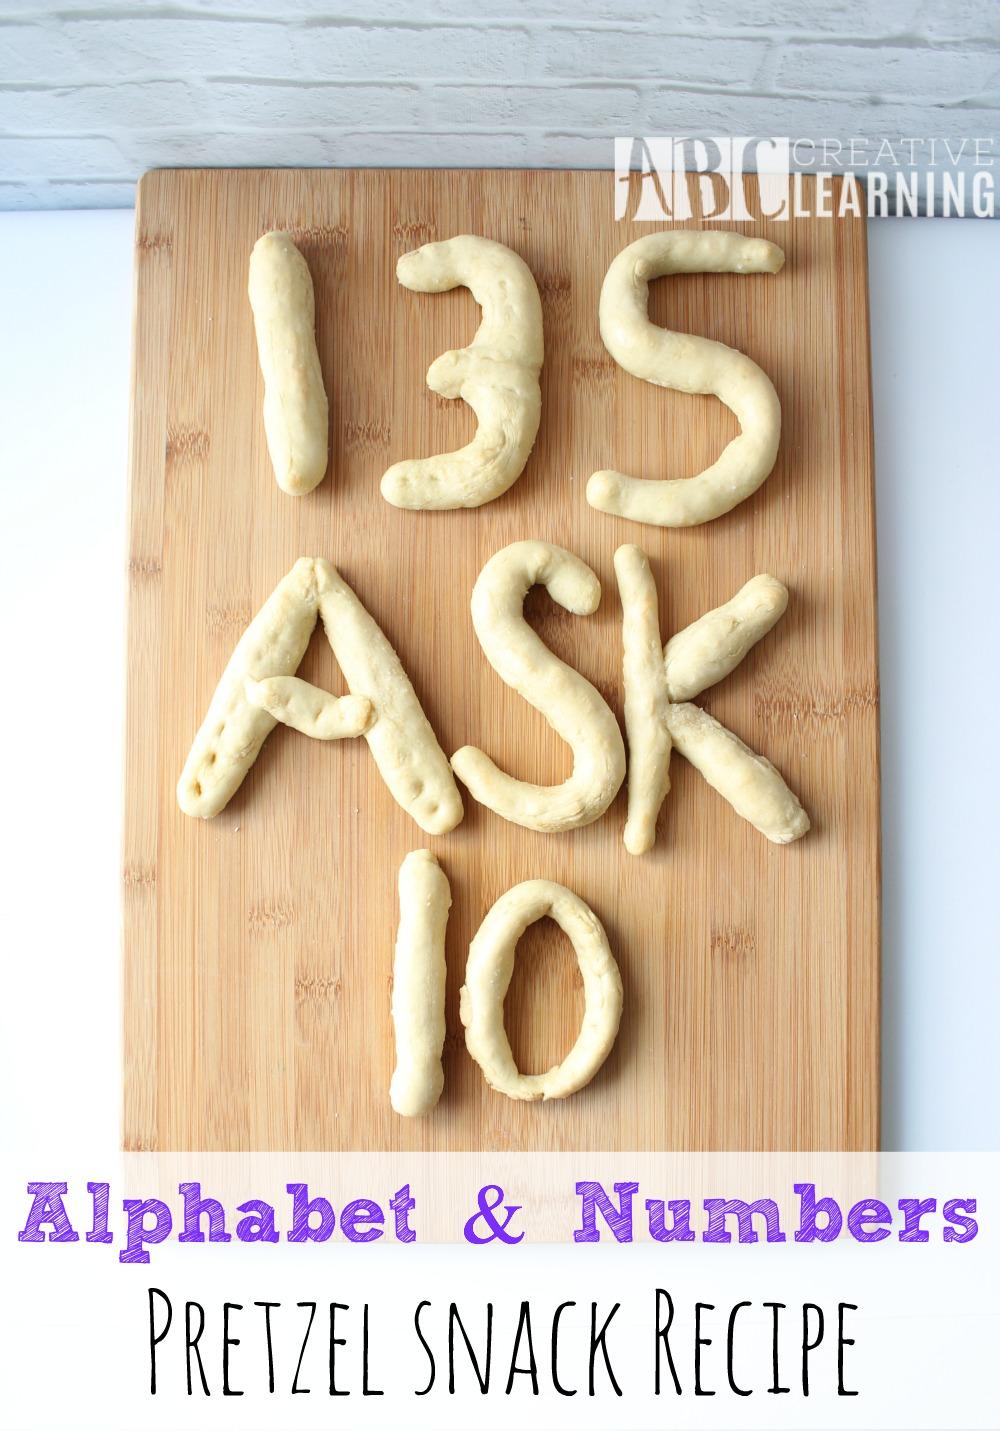 Alphabet & Numbers Pretzel Snack Recipe